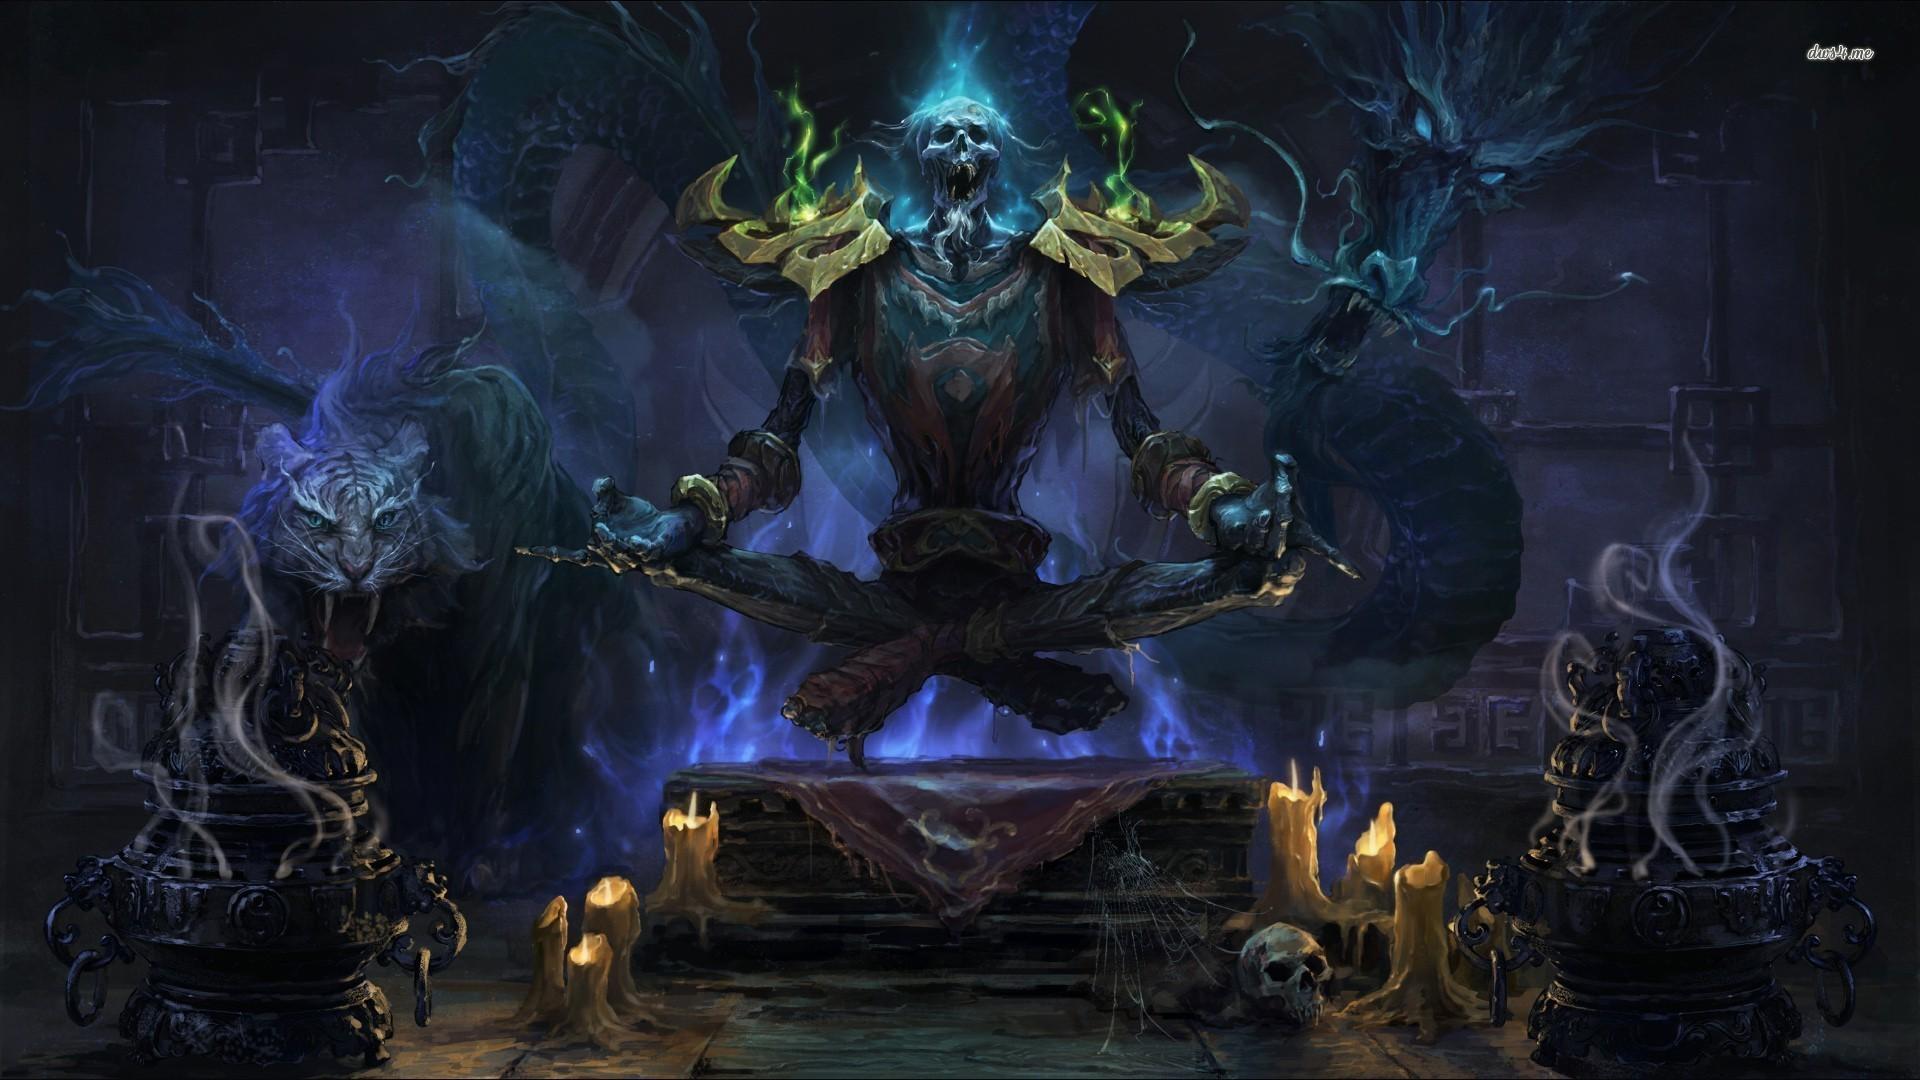 World of Warcraft Druid Wallpaper World of Warcraft Wallpaper